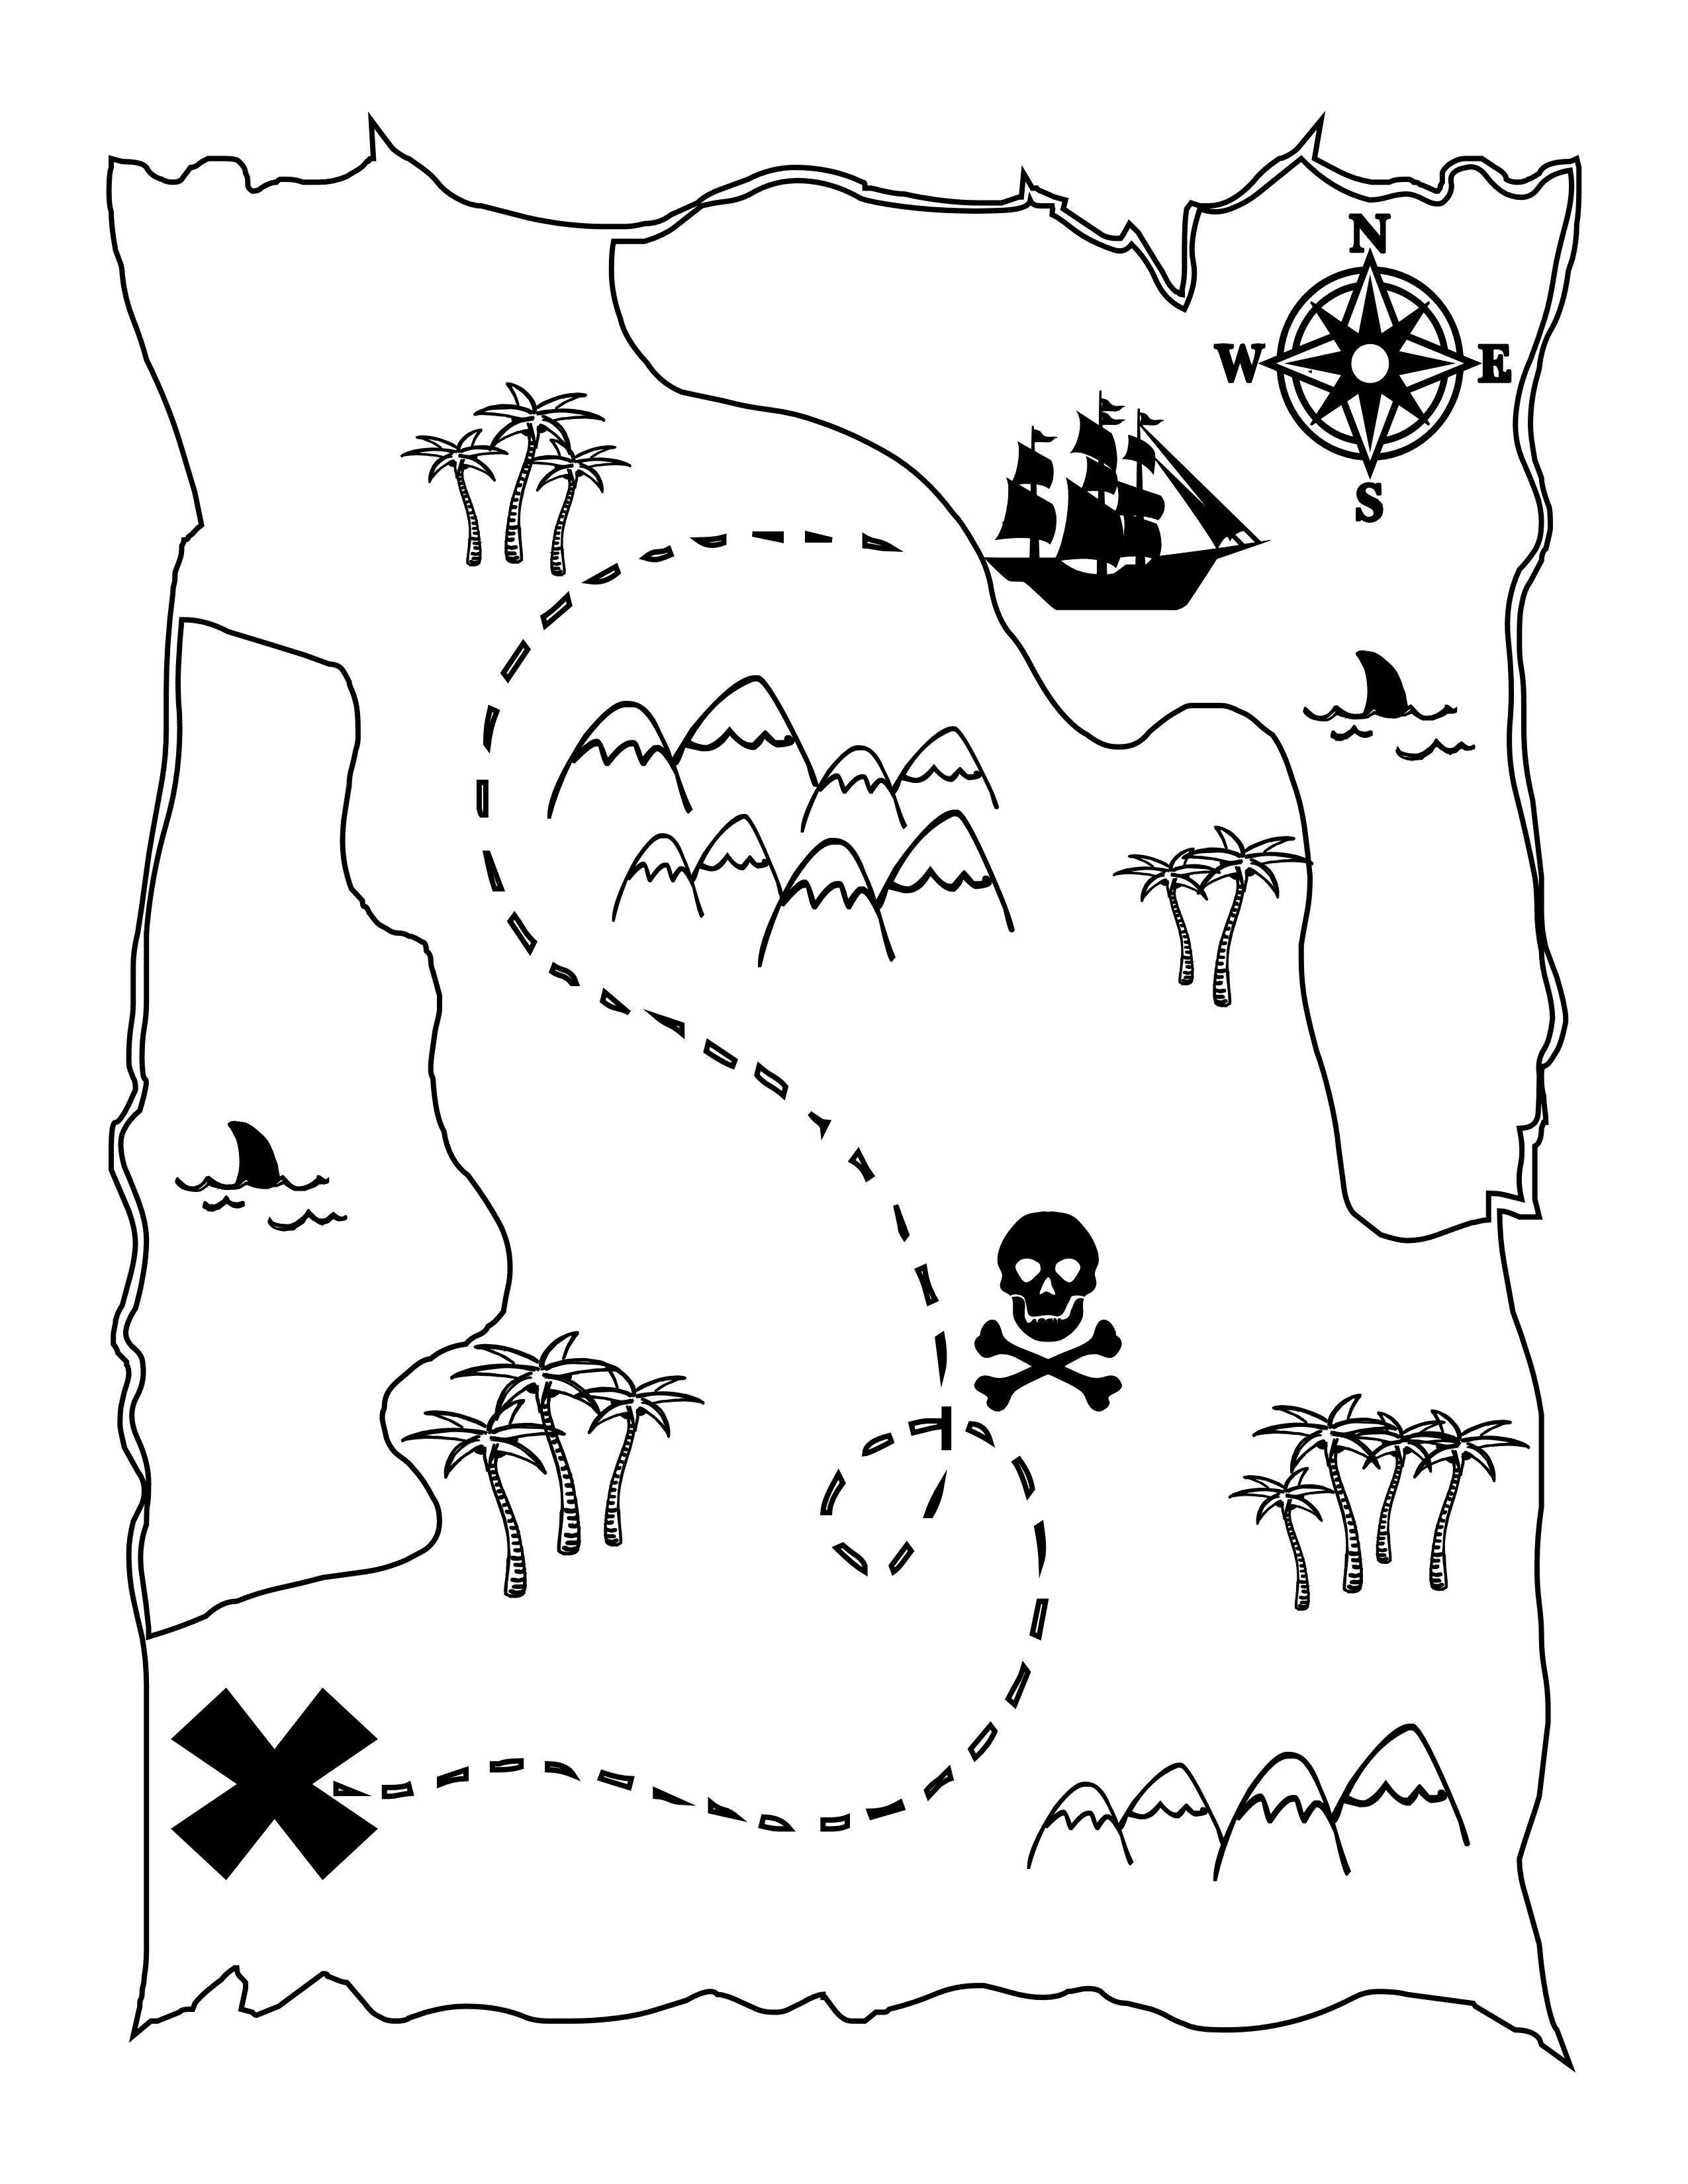 Printable Treasure Map Kids Activity | Printables | Pinterest - Free Printable Pirate Maps